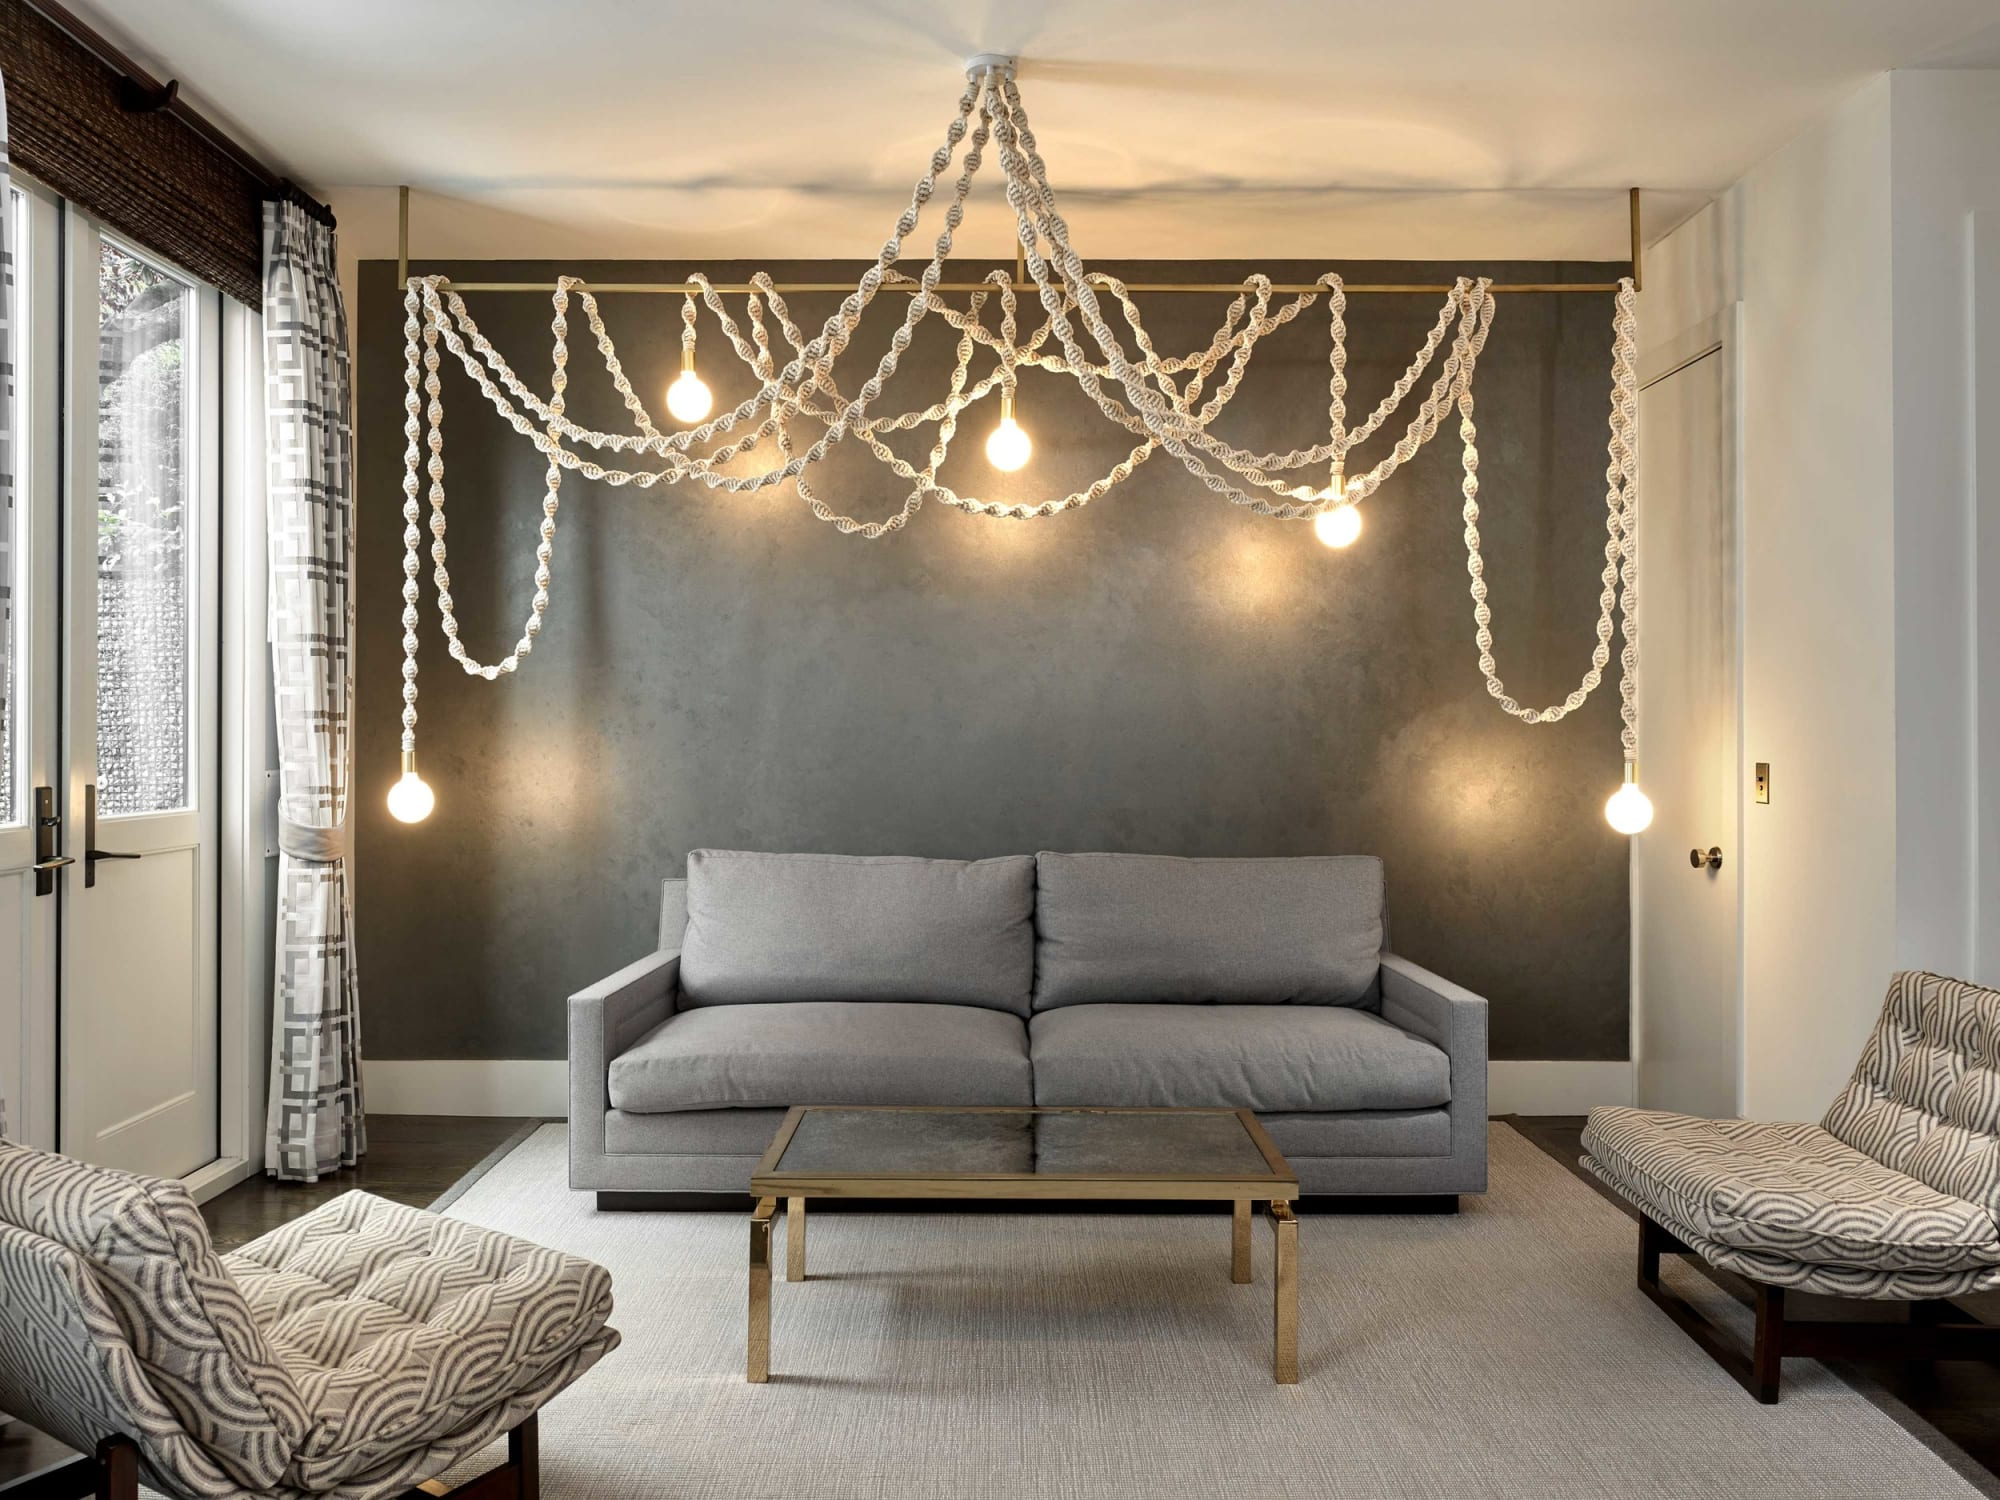 Rope hanging light fixture